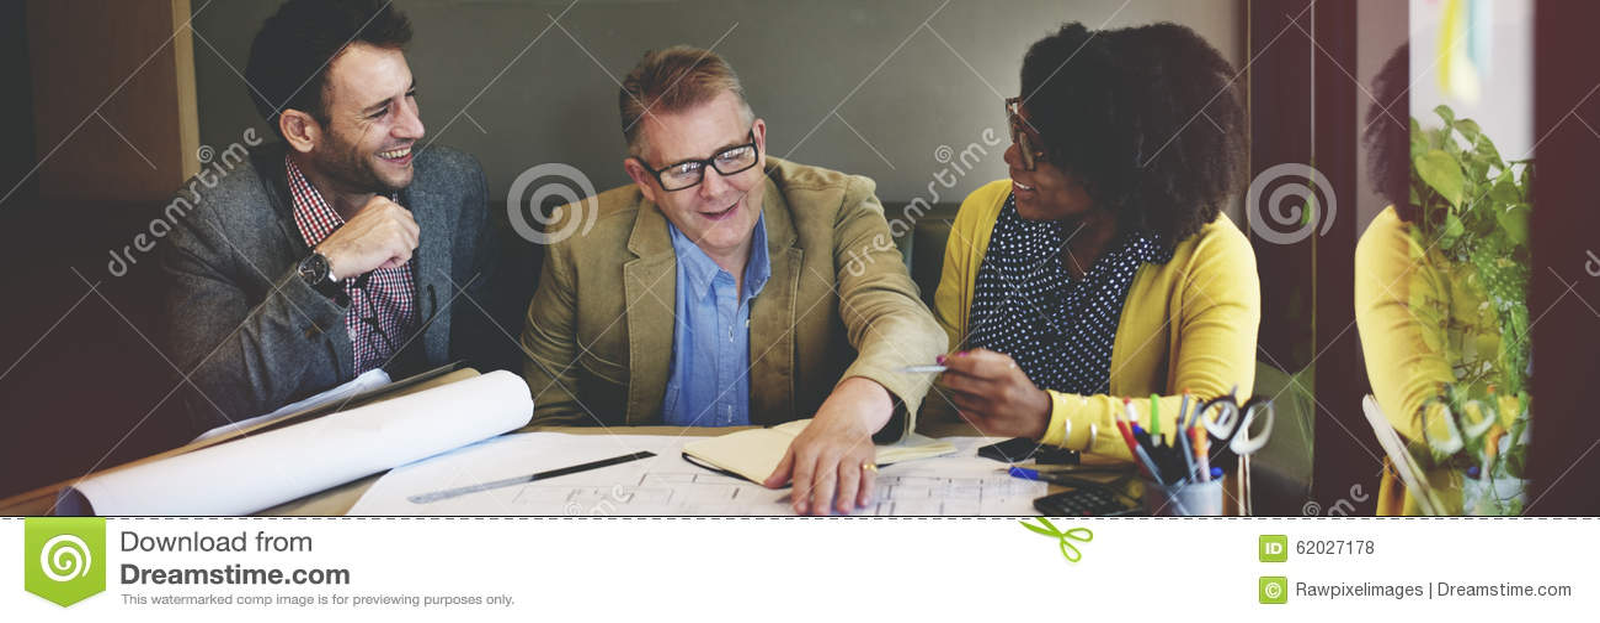 Gruppen-Architekten-Meeting Planning Blueprint-Konzept